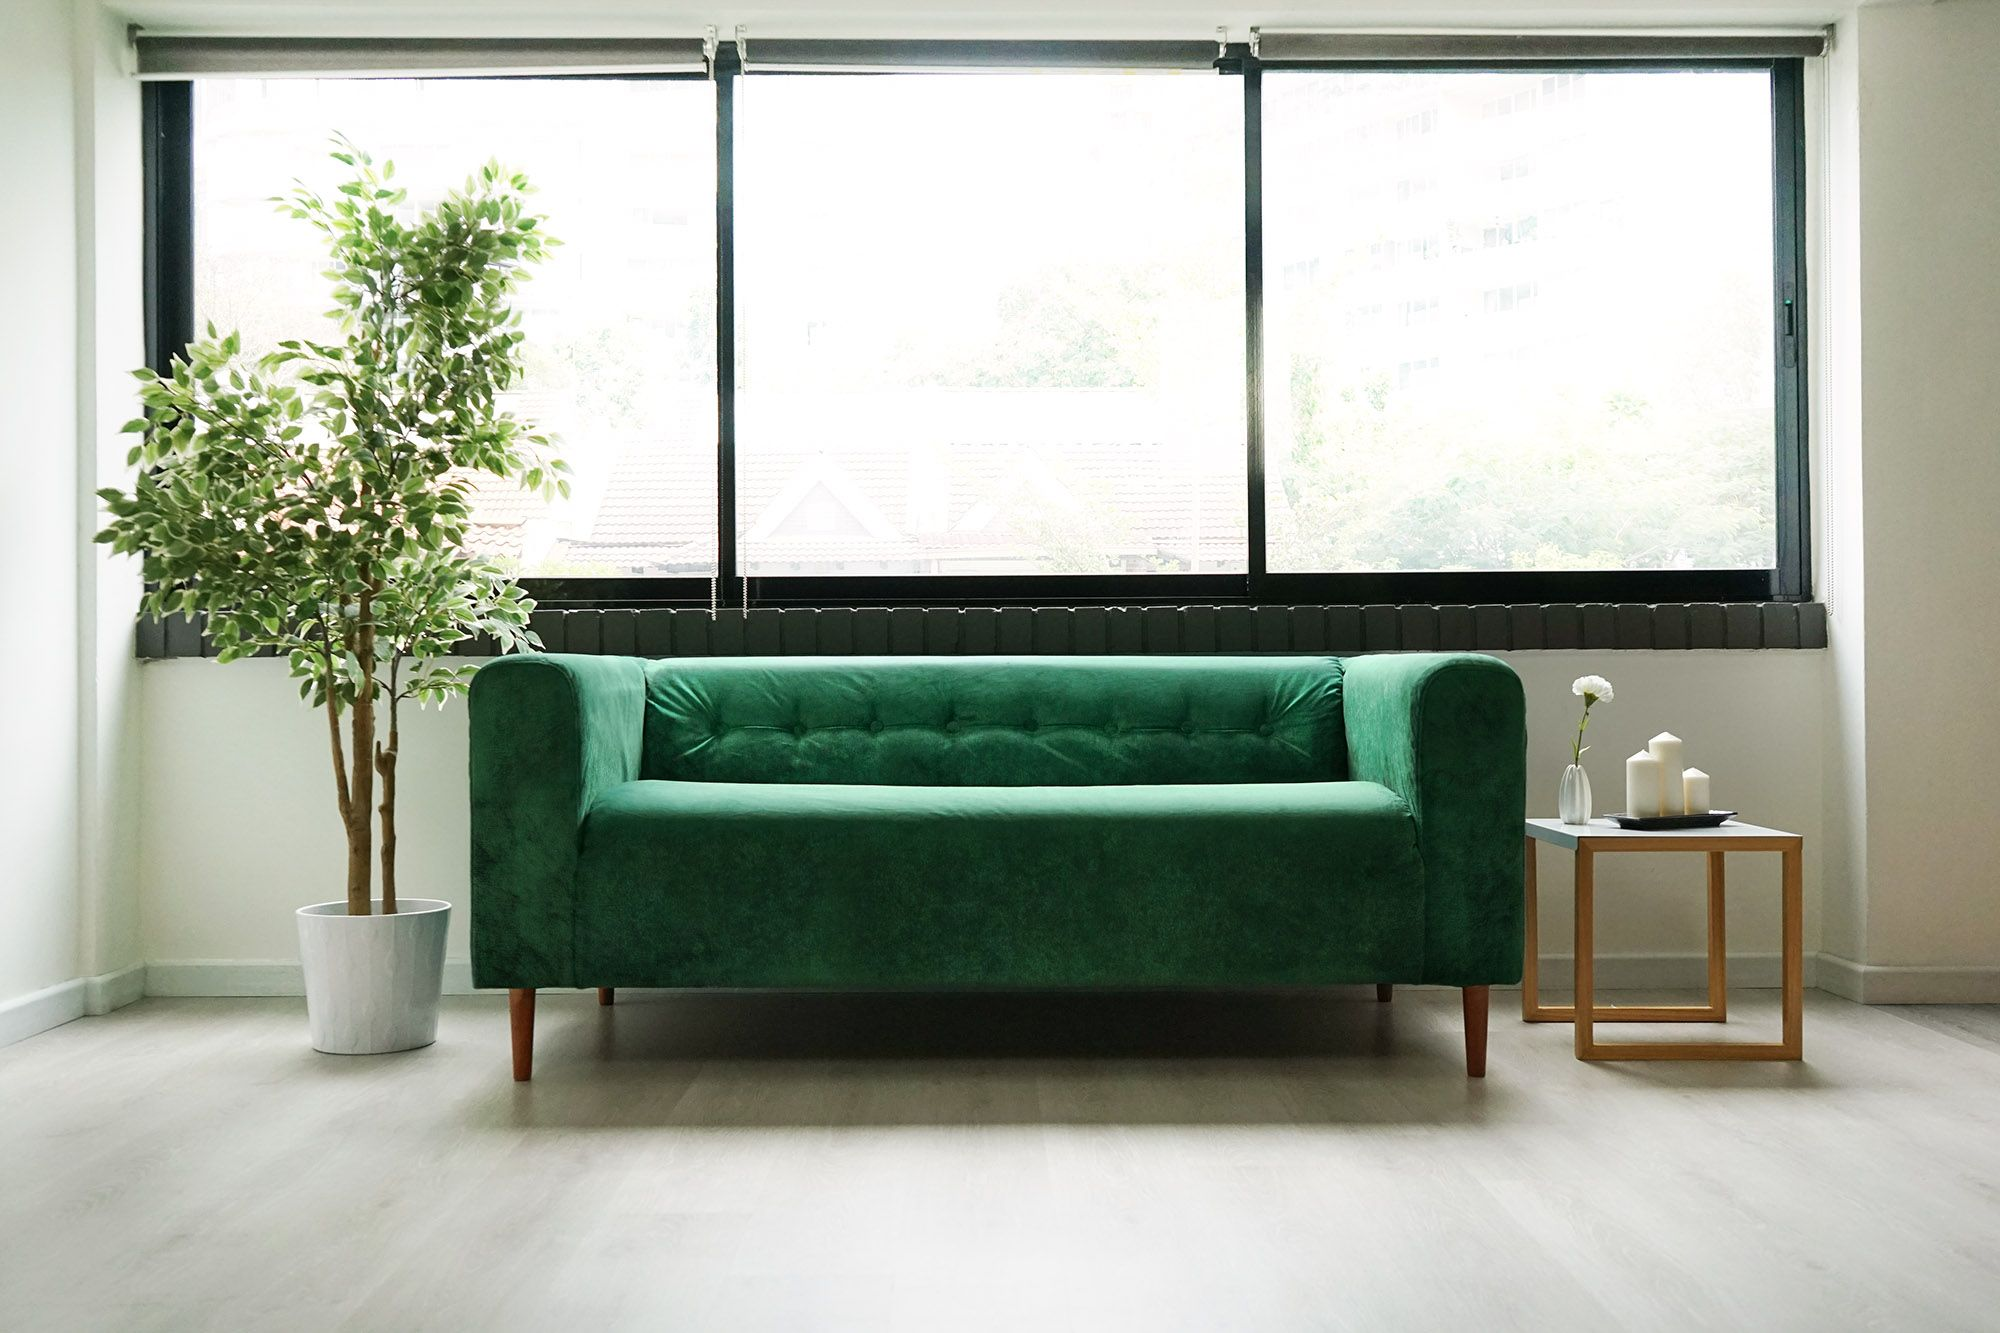 Tufting IKEA Klippan Hack U2013 Be Emerald Green With Envy! Ikea Hack Sofa, Ikea